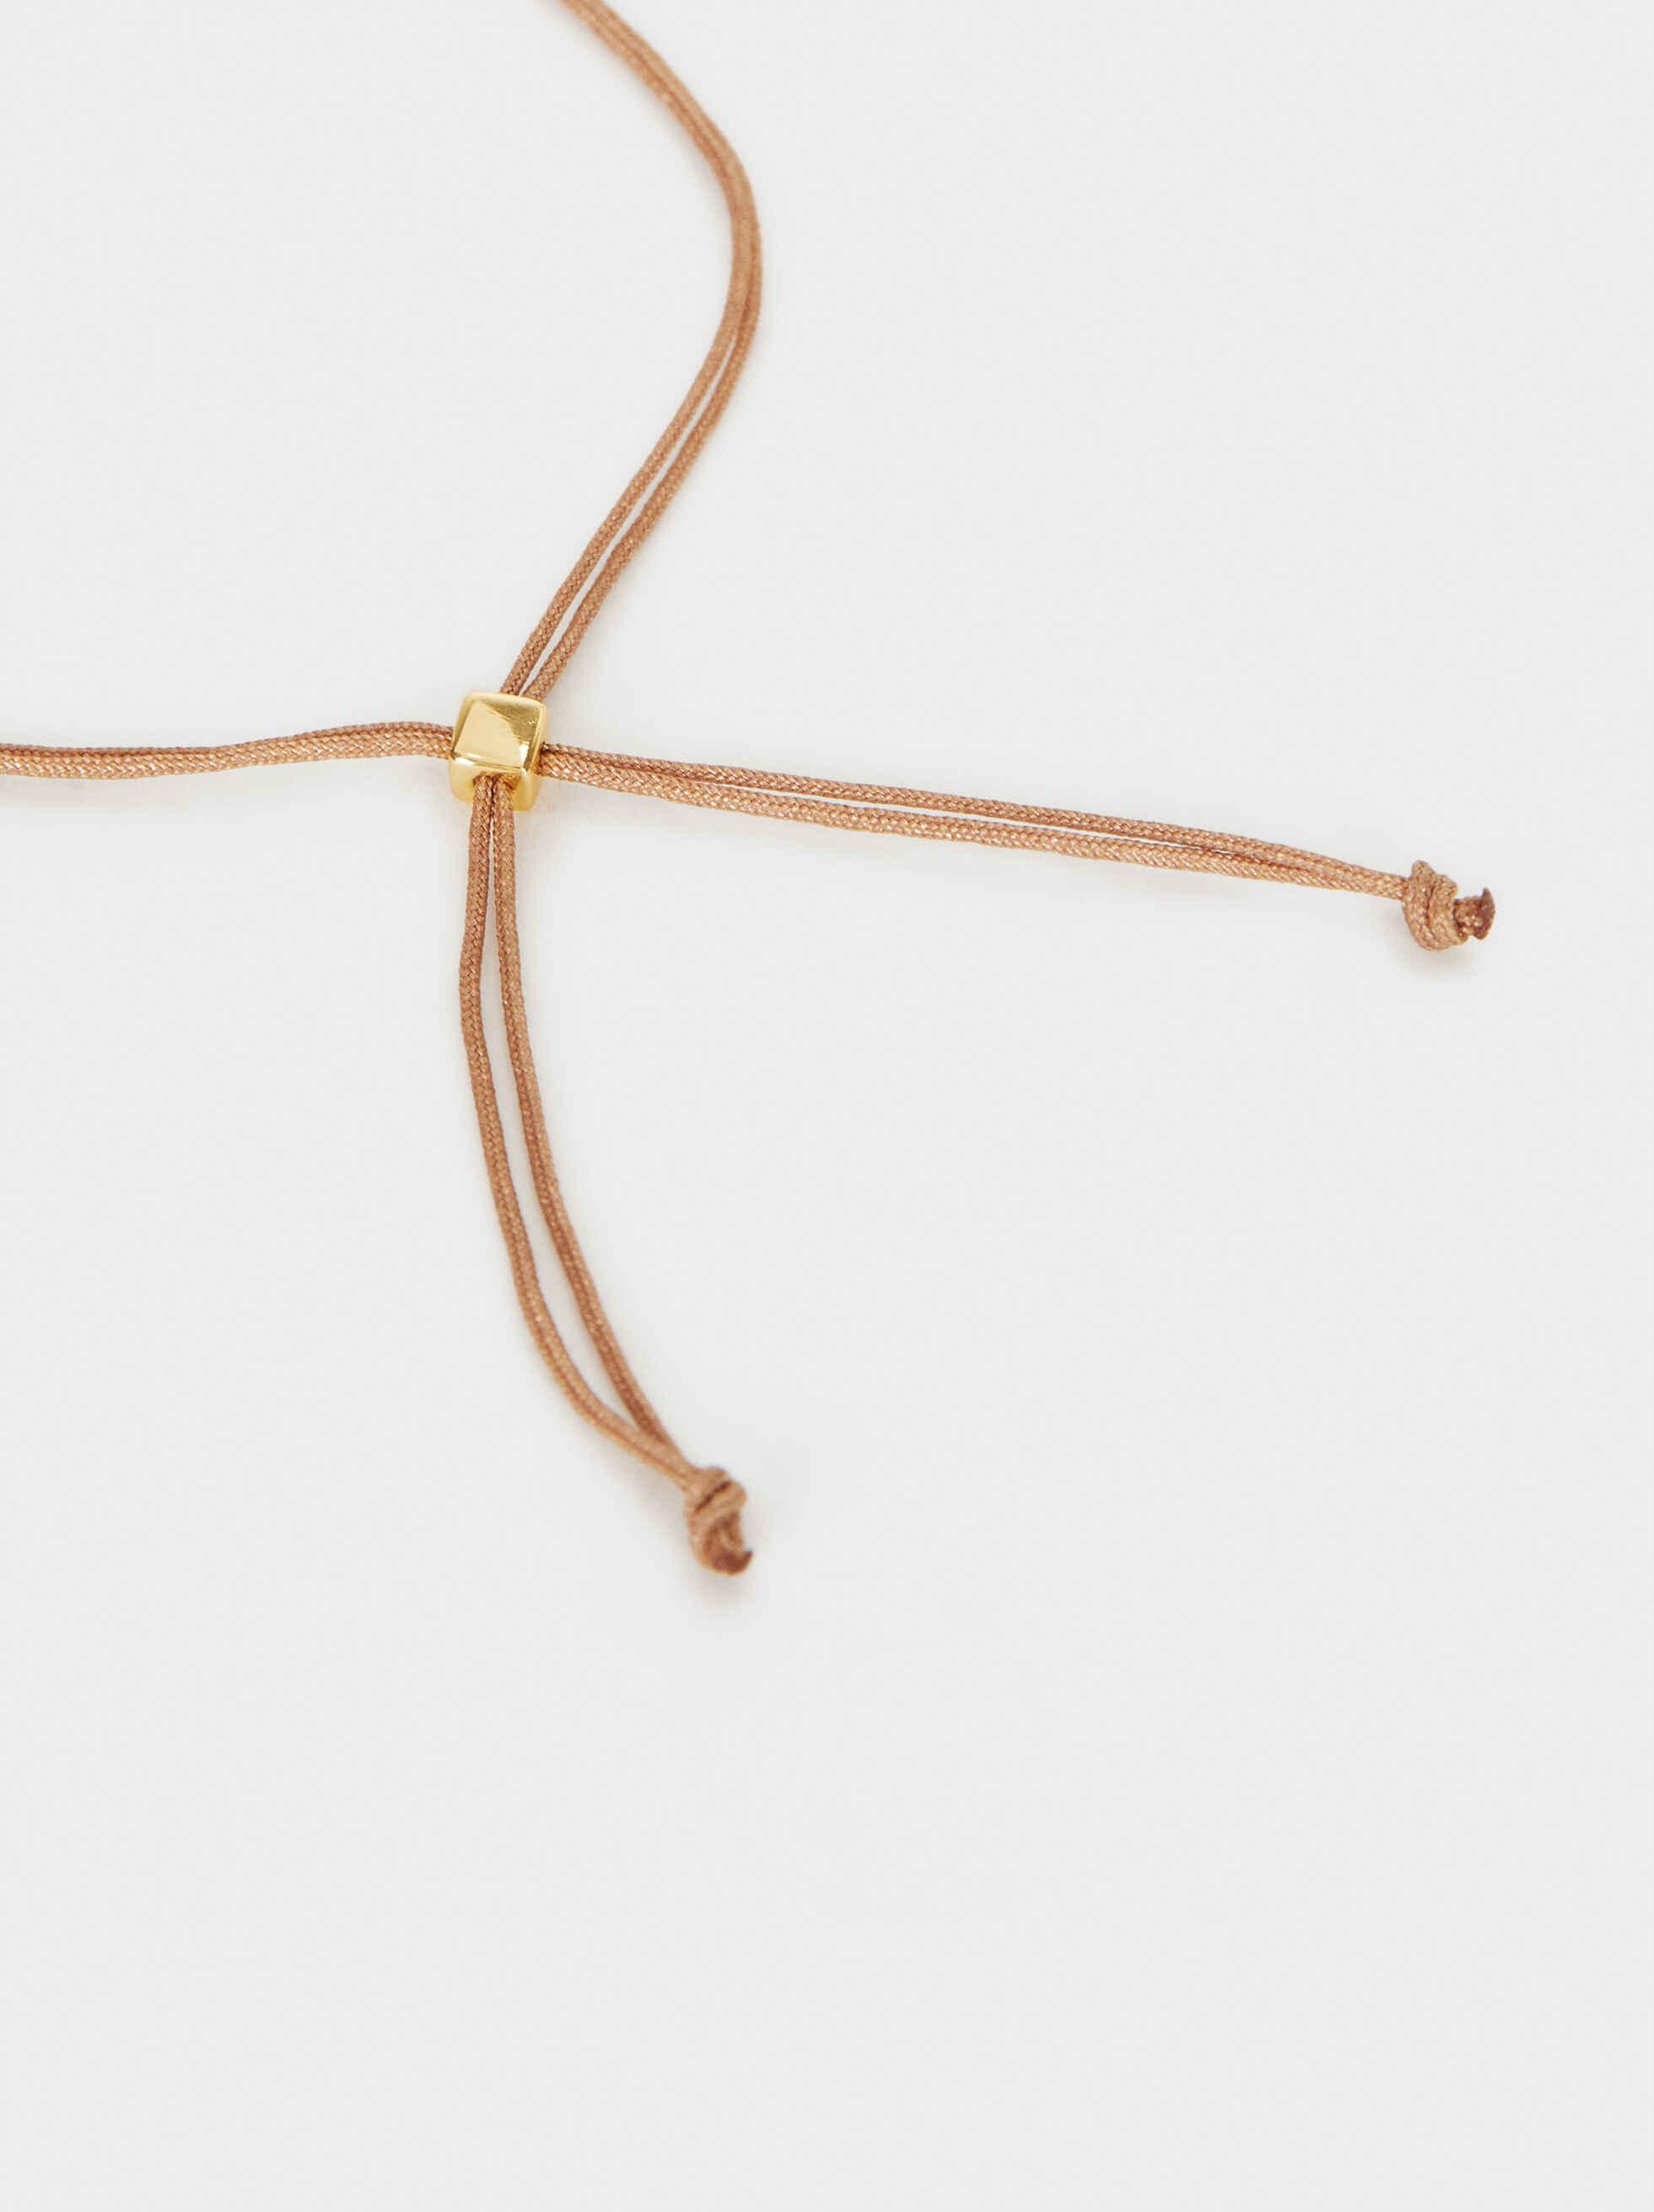 925 Silver Adjustable Bracelet With Stone, Coral, hi-res